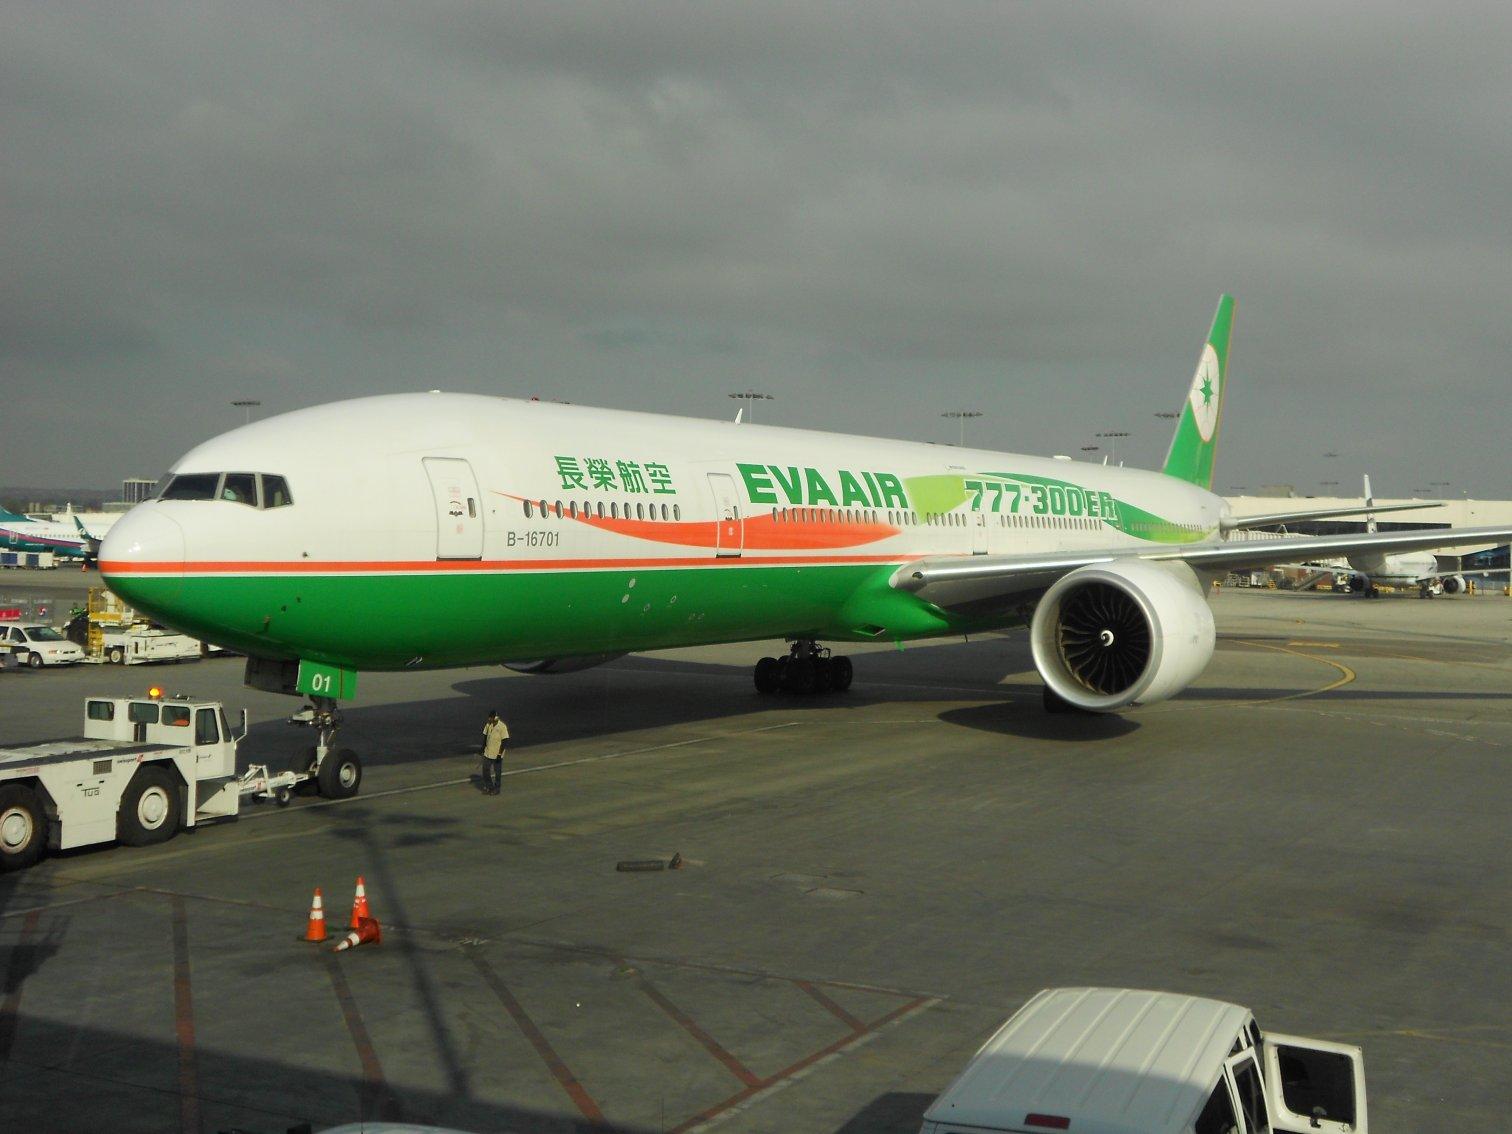 http://4.bp.blogspot.com/-gyog6yU1Hqc/TtGmVGXtrSI/AAAAAAAAAKs/O9rEHjDSx54/s1600/eva+airplane.JPG